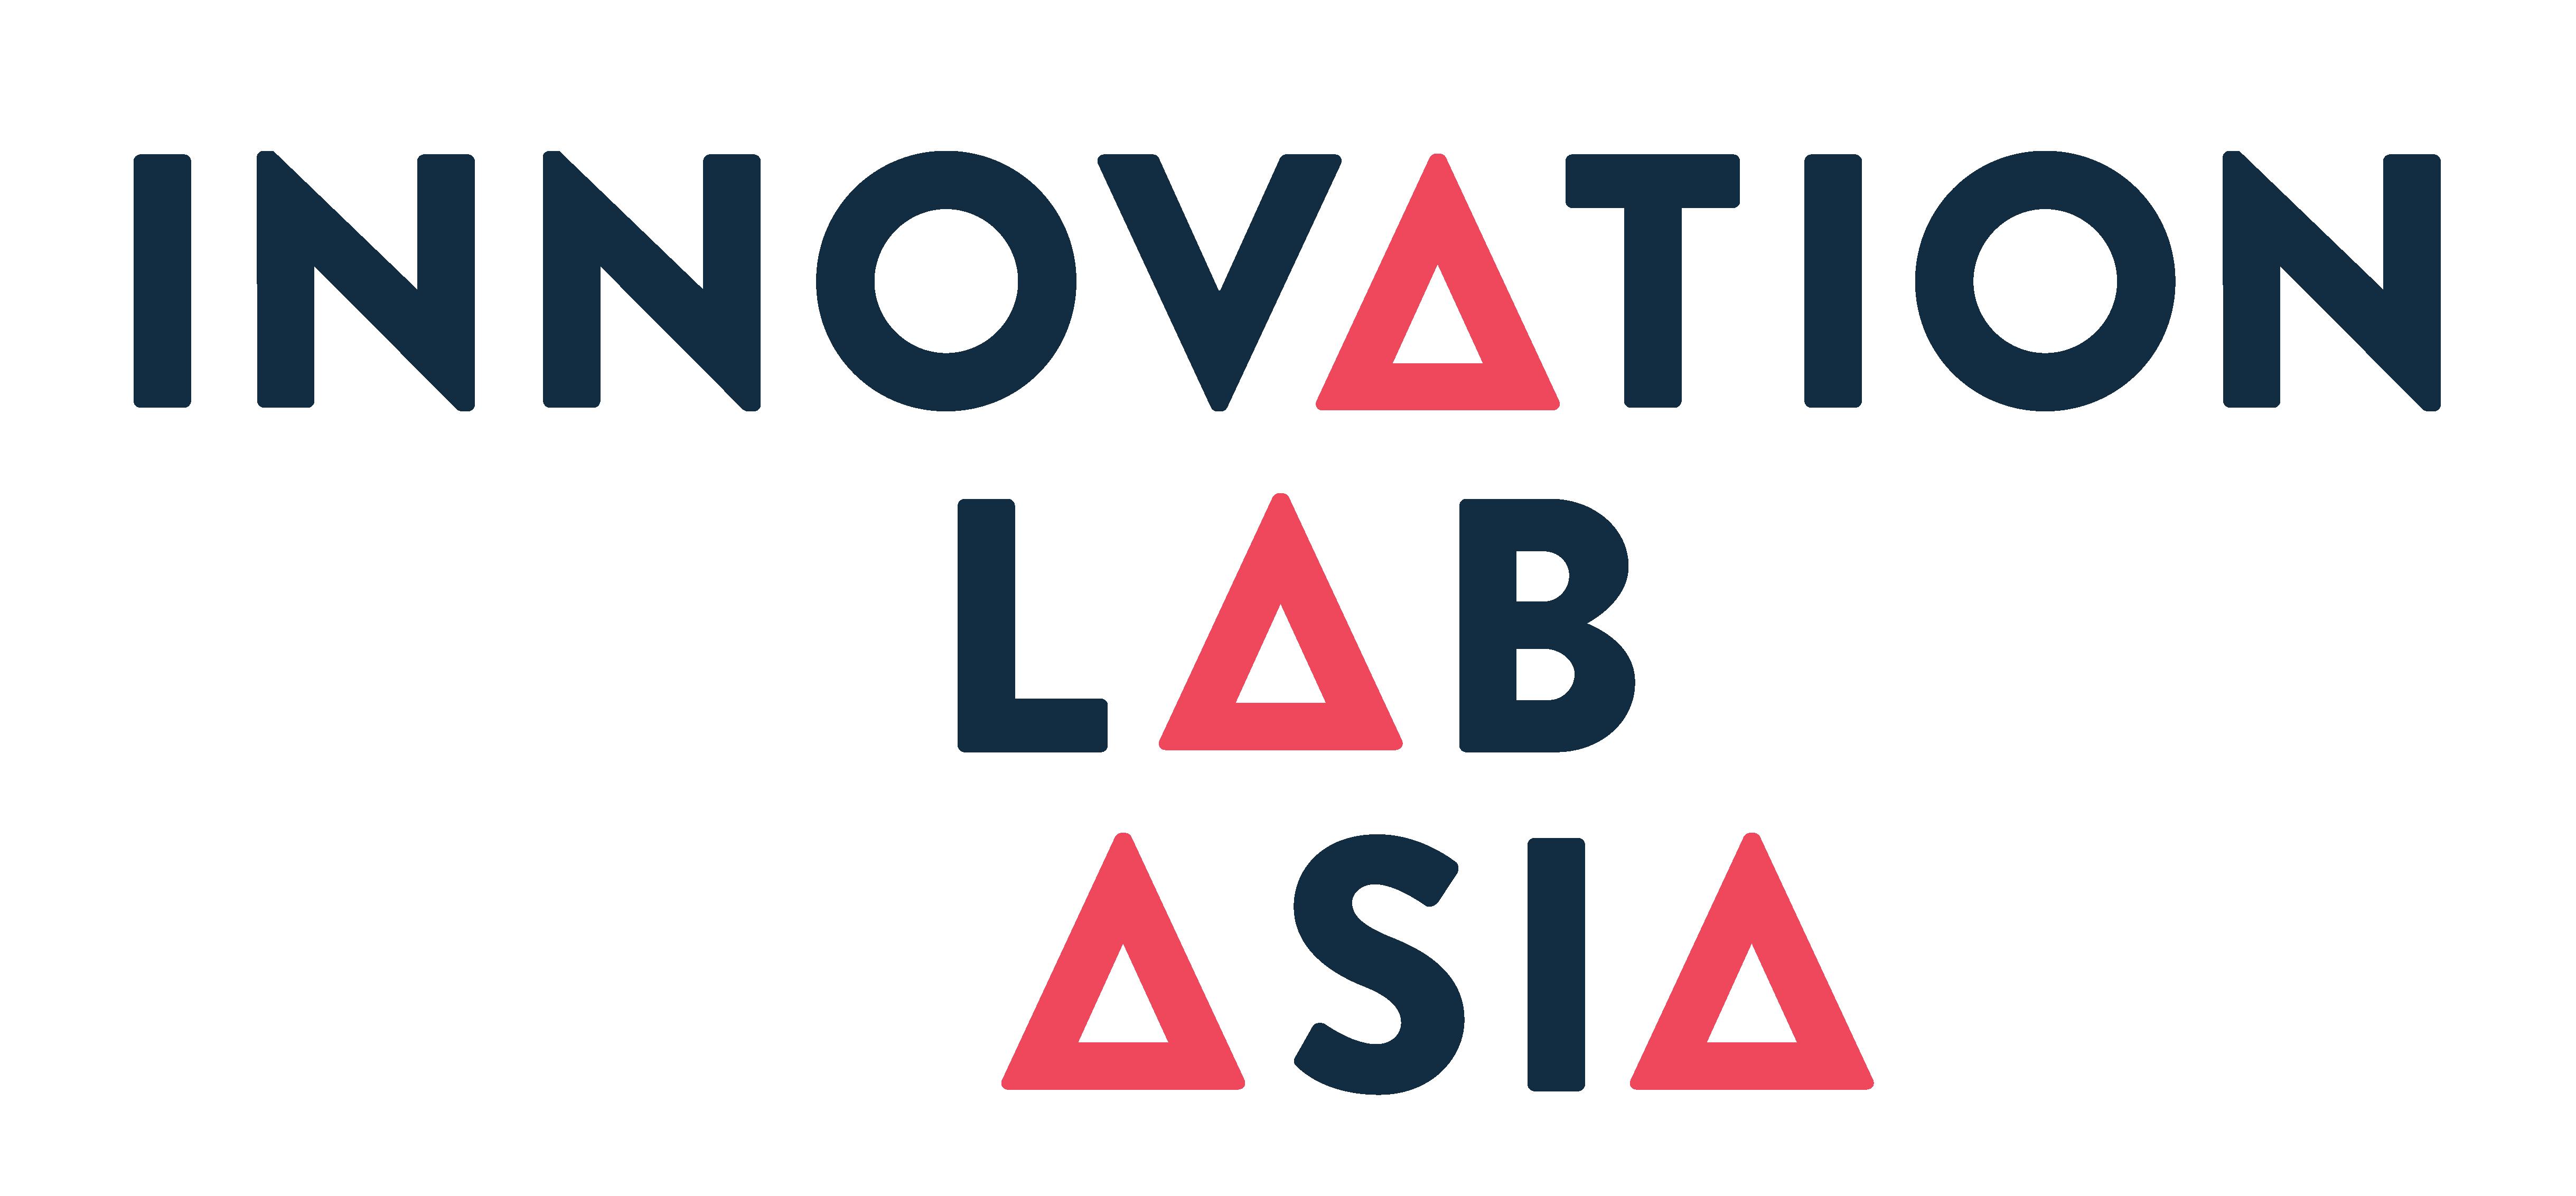 Innovation_Lab_Asia_logo_blue_pink